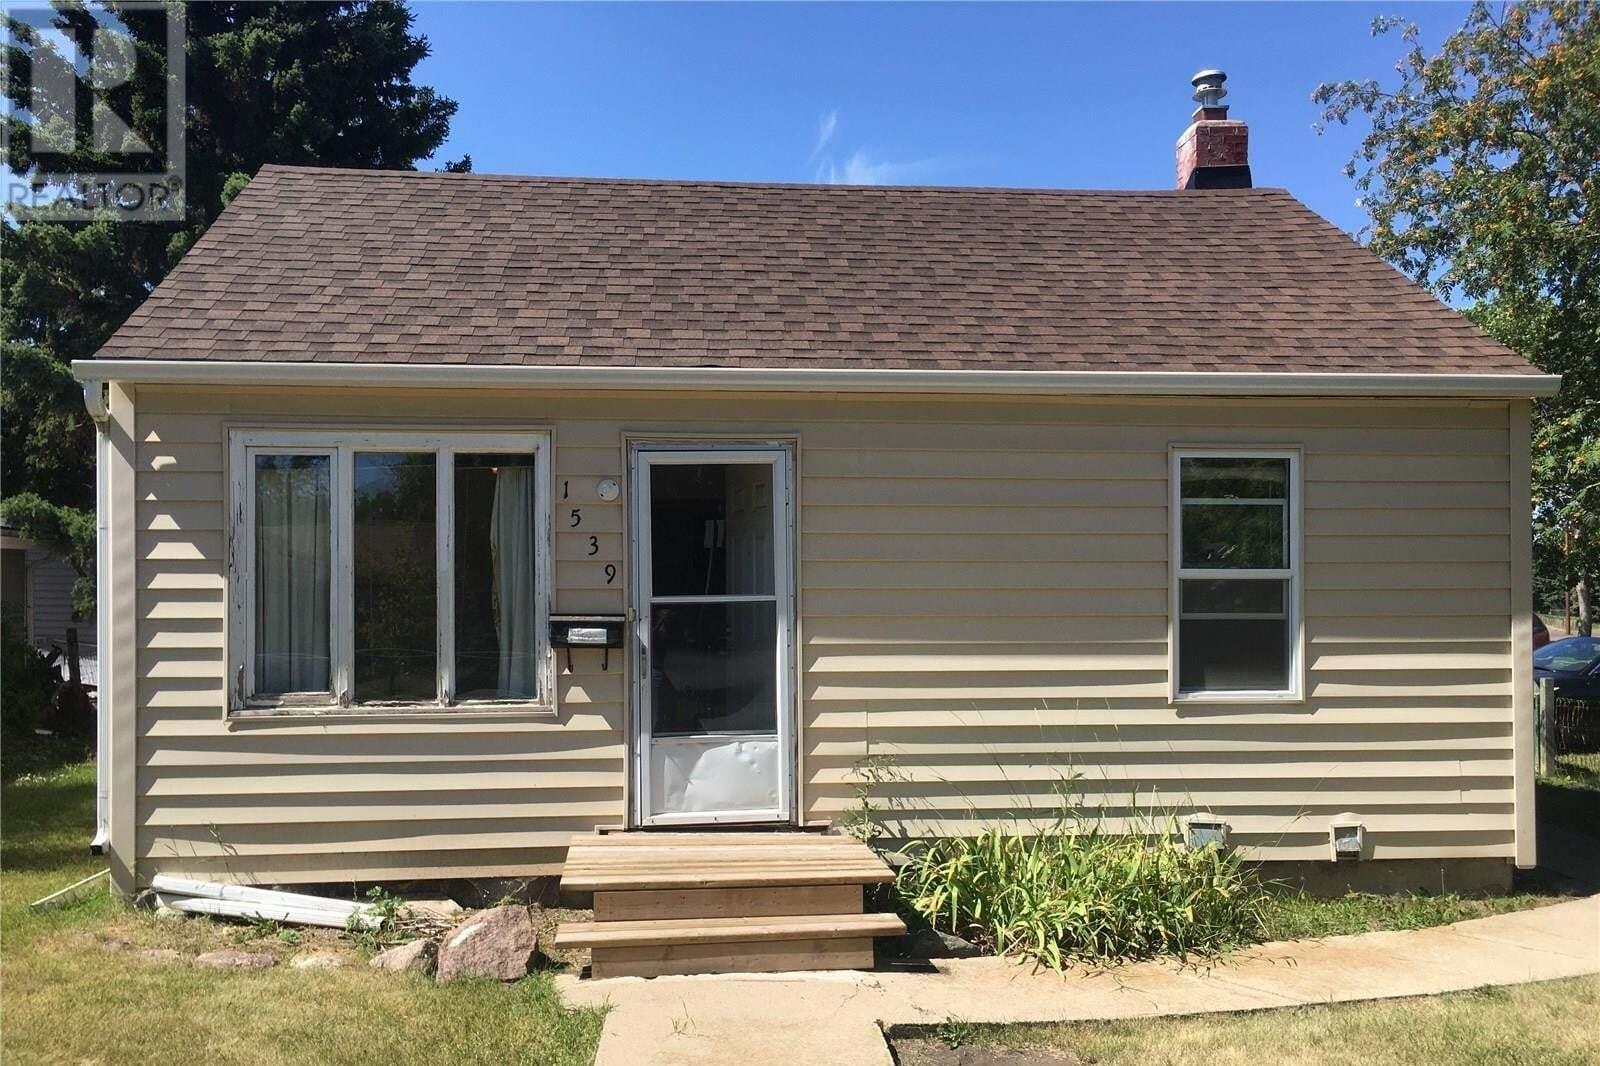 House for sale at 1539 D Ave N Saskatoon Saskatchewan - MLS: SK825776